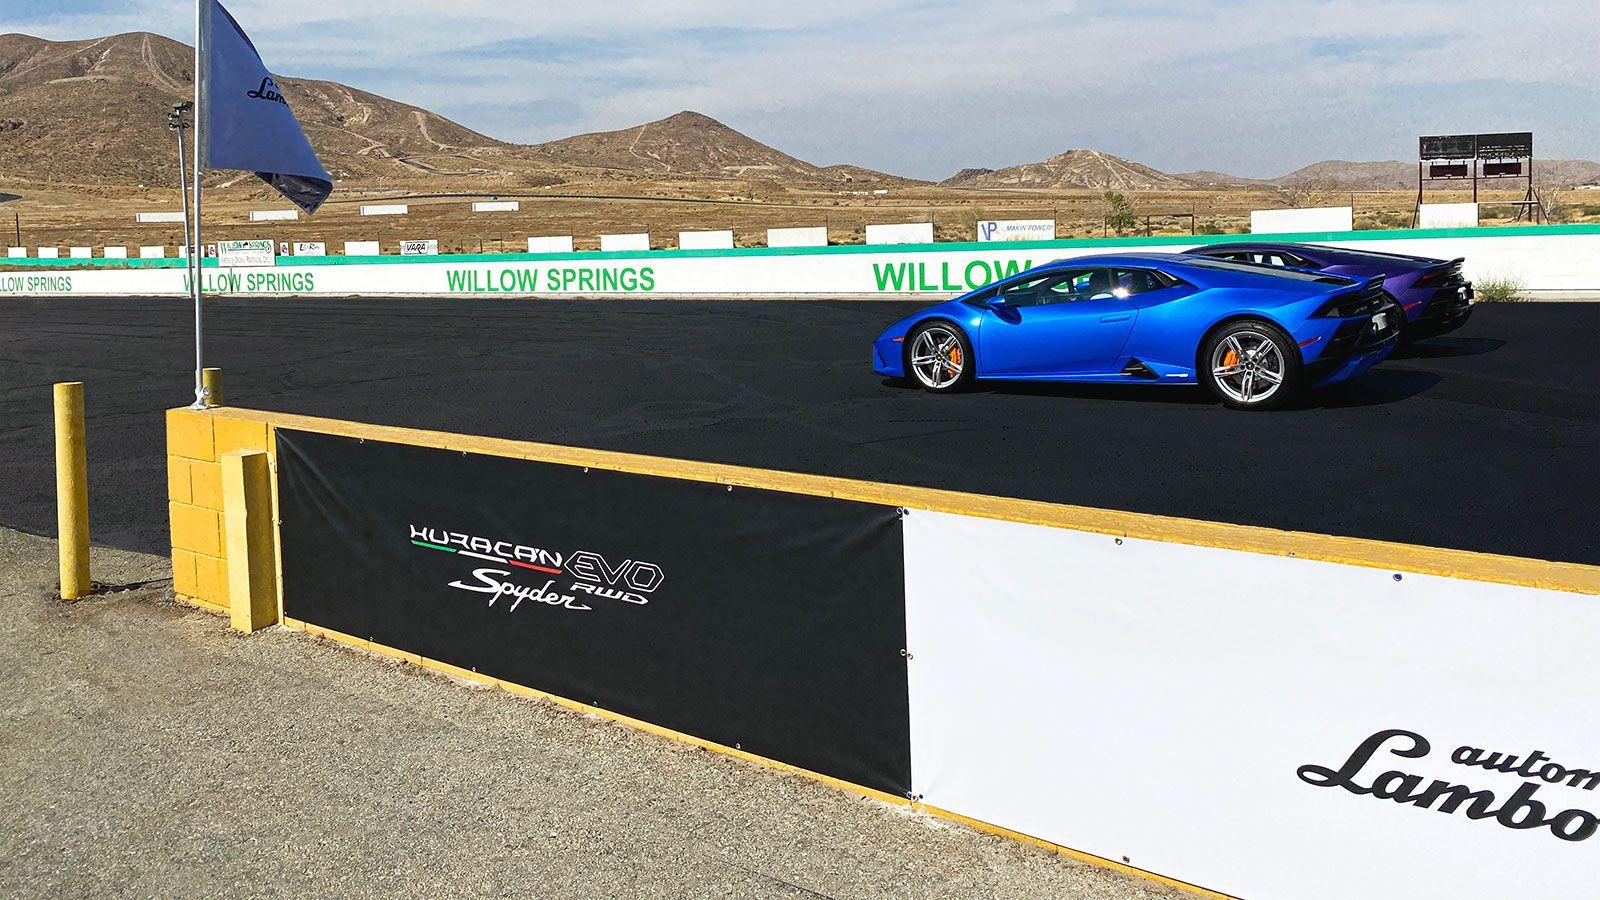 Lamborghini vinyl banners